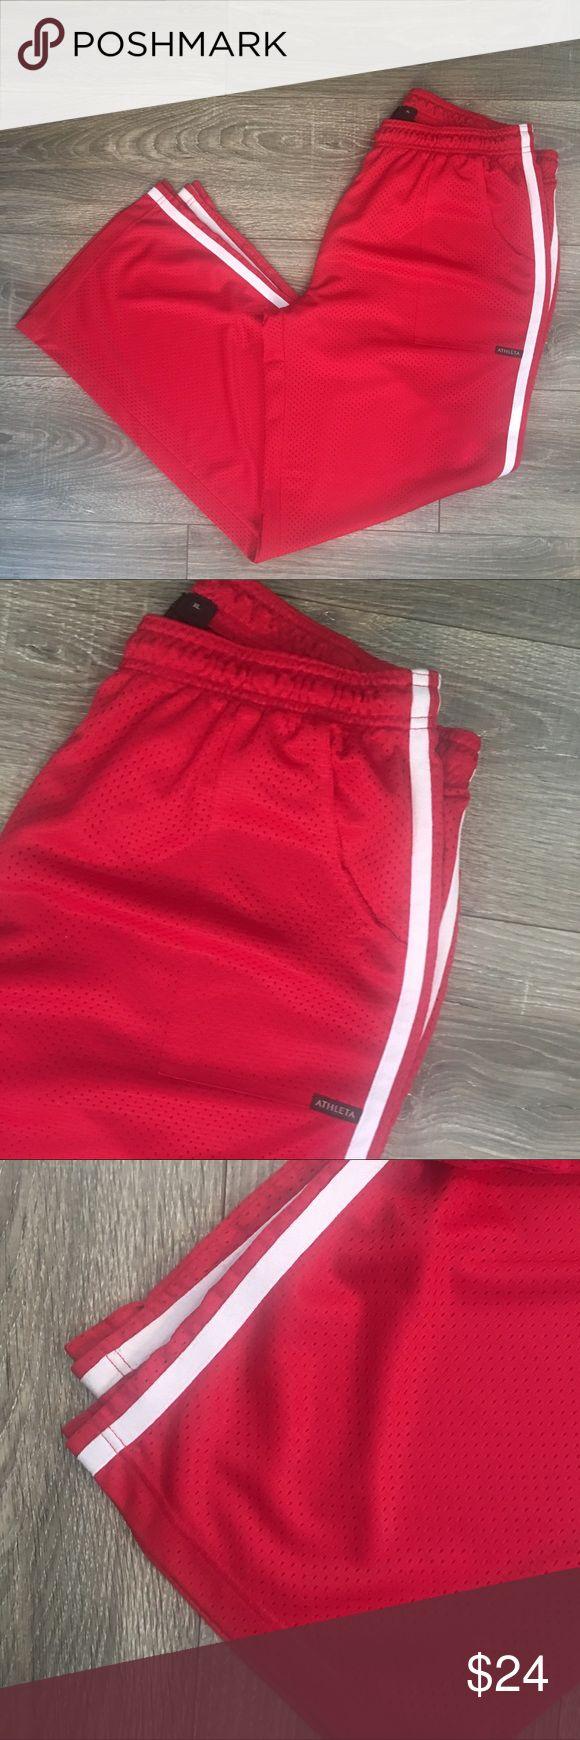 Athleta mesh warm up basketball pants Women's Athleta Size XL Red mesh (perforated fabric) Warm up/athletic pants- basketball style JT009 Athleta Pants Track Pants & Joggers